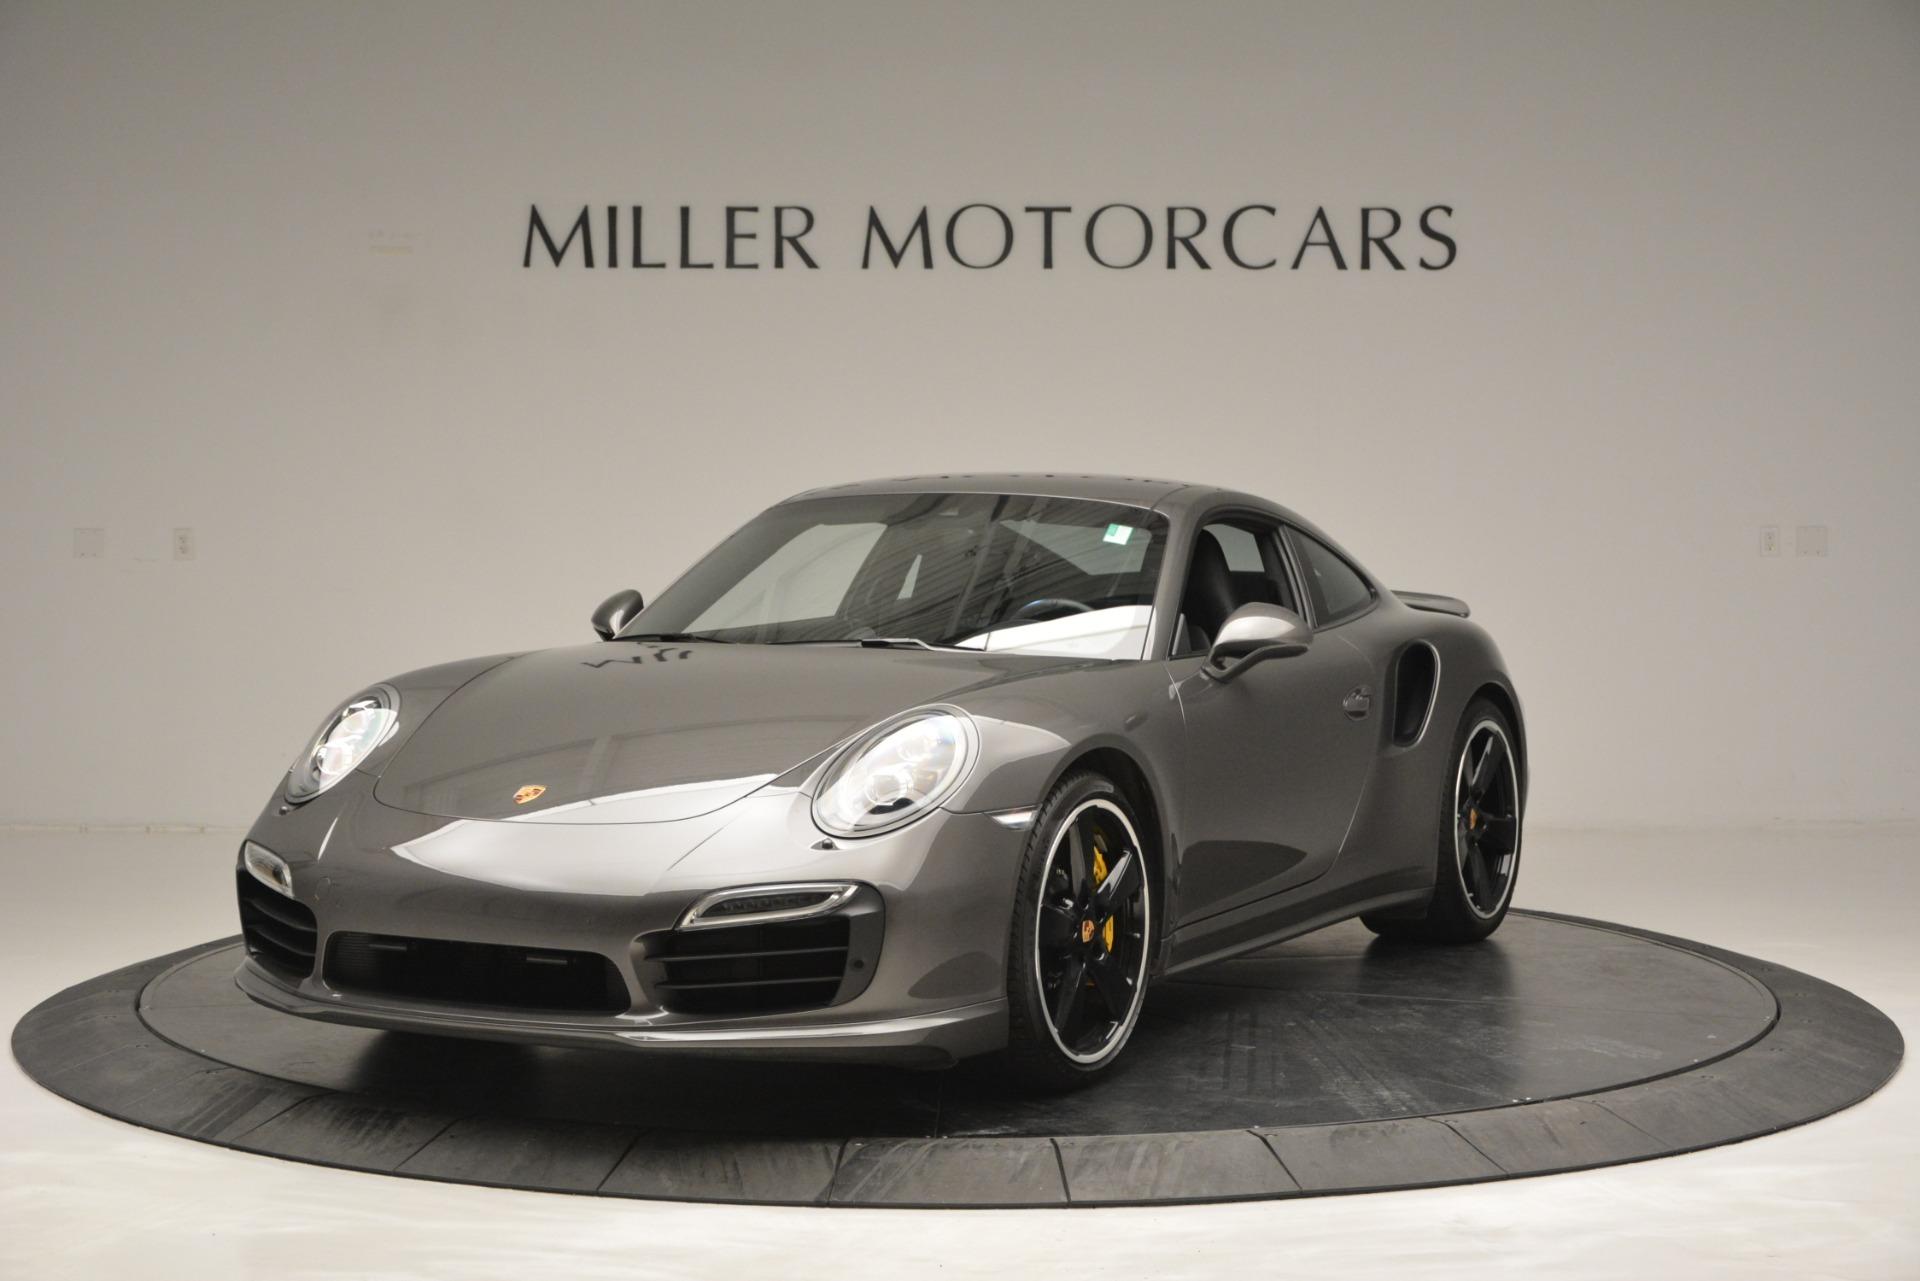 Used 2015 Porsche 911 Turbo S For Sale In Greenwich, CT 2923_main